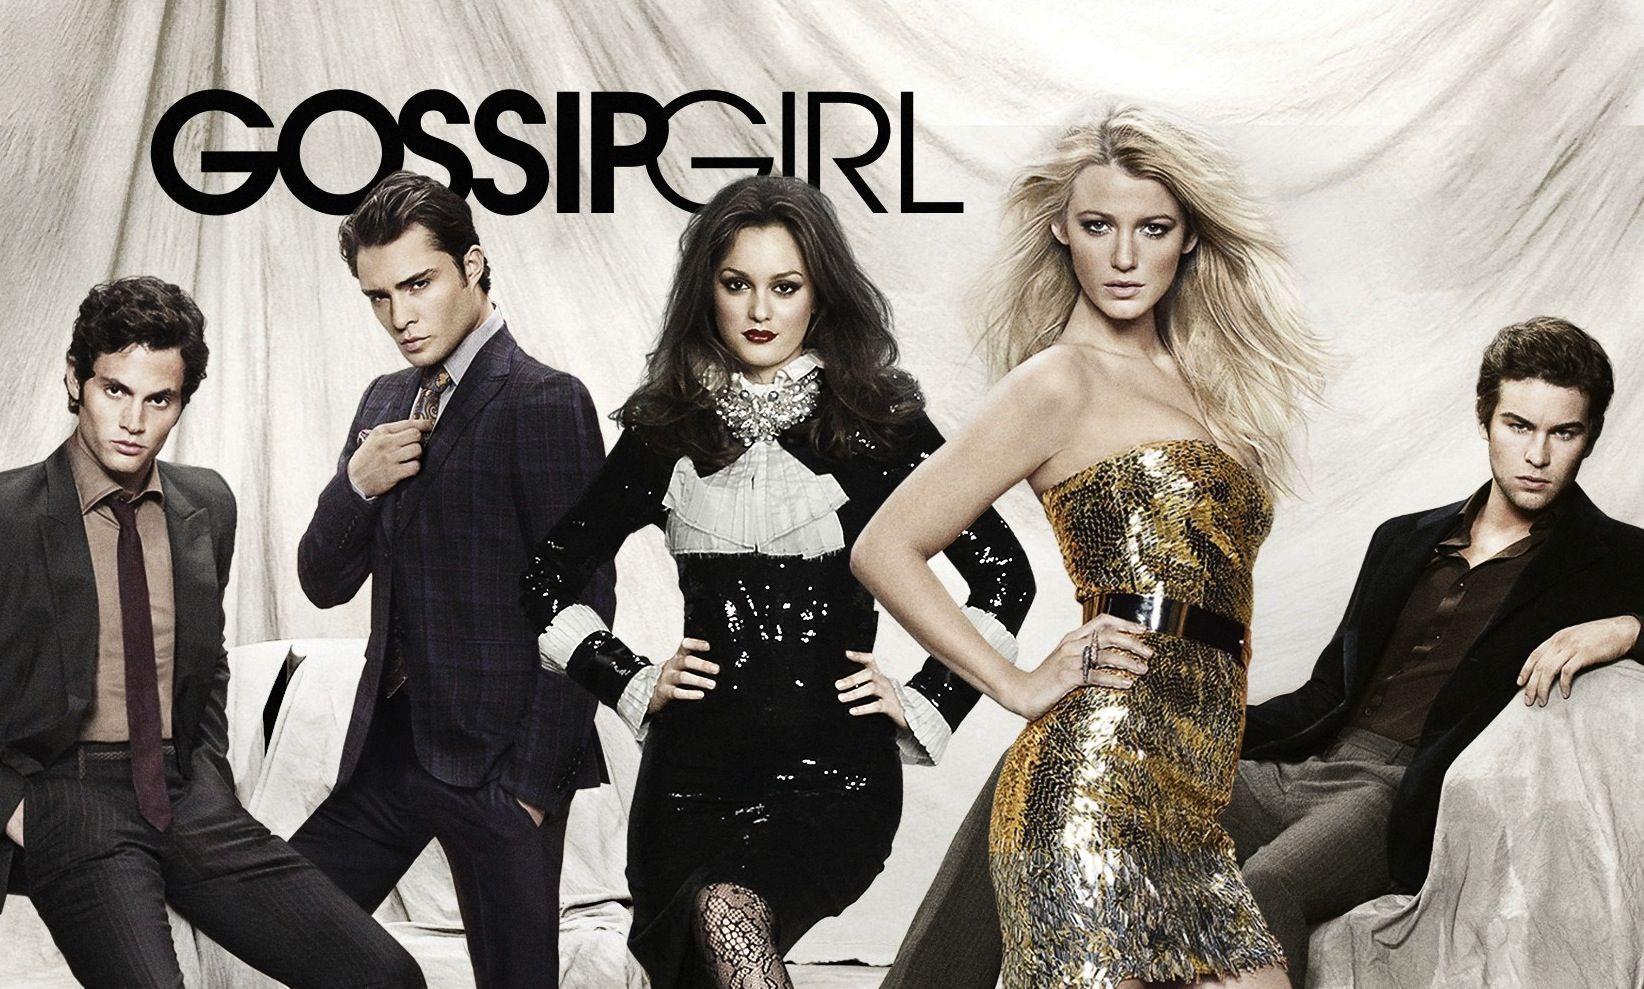 1600x1114px Gossip Girl 676.67 KB #243669